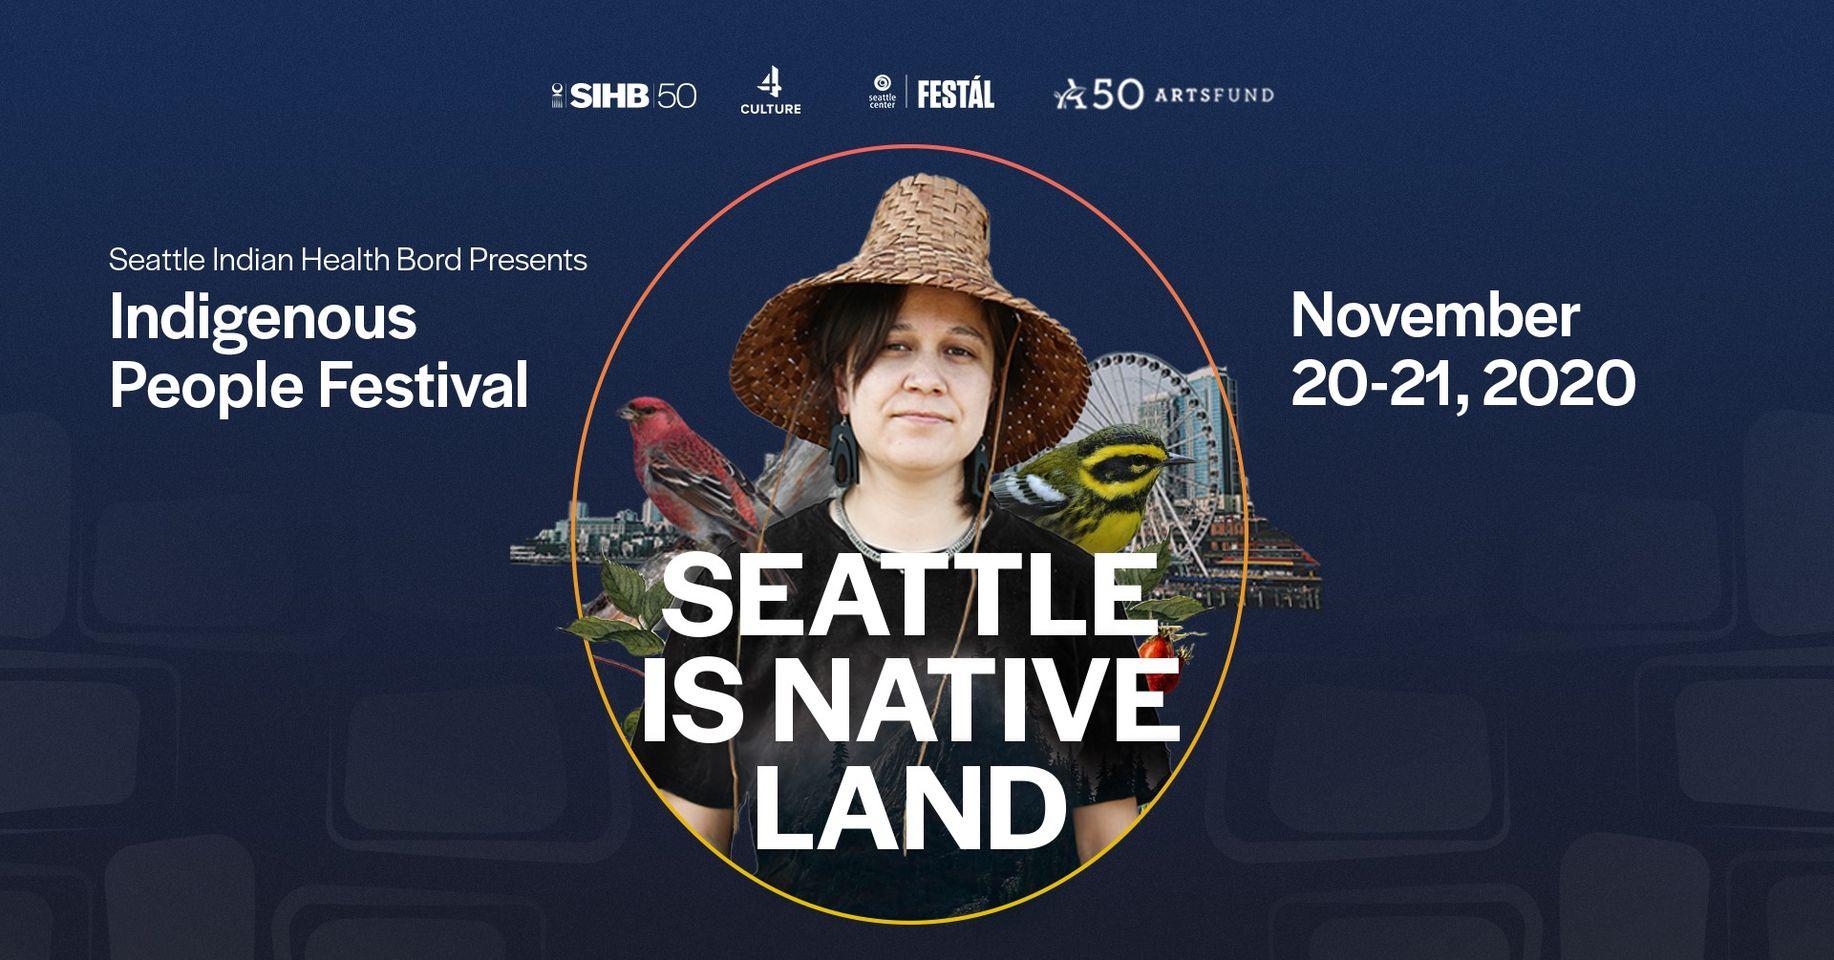 Indigenous People Festival 11/2020